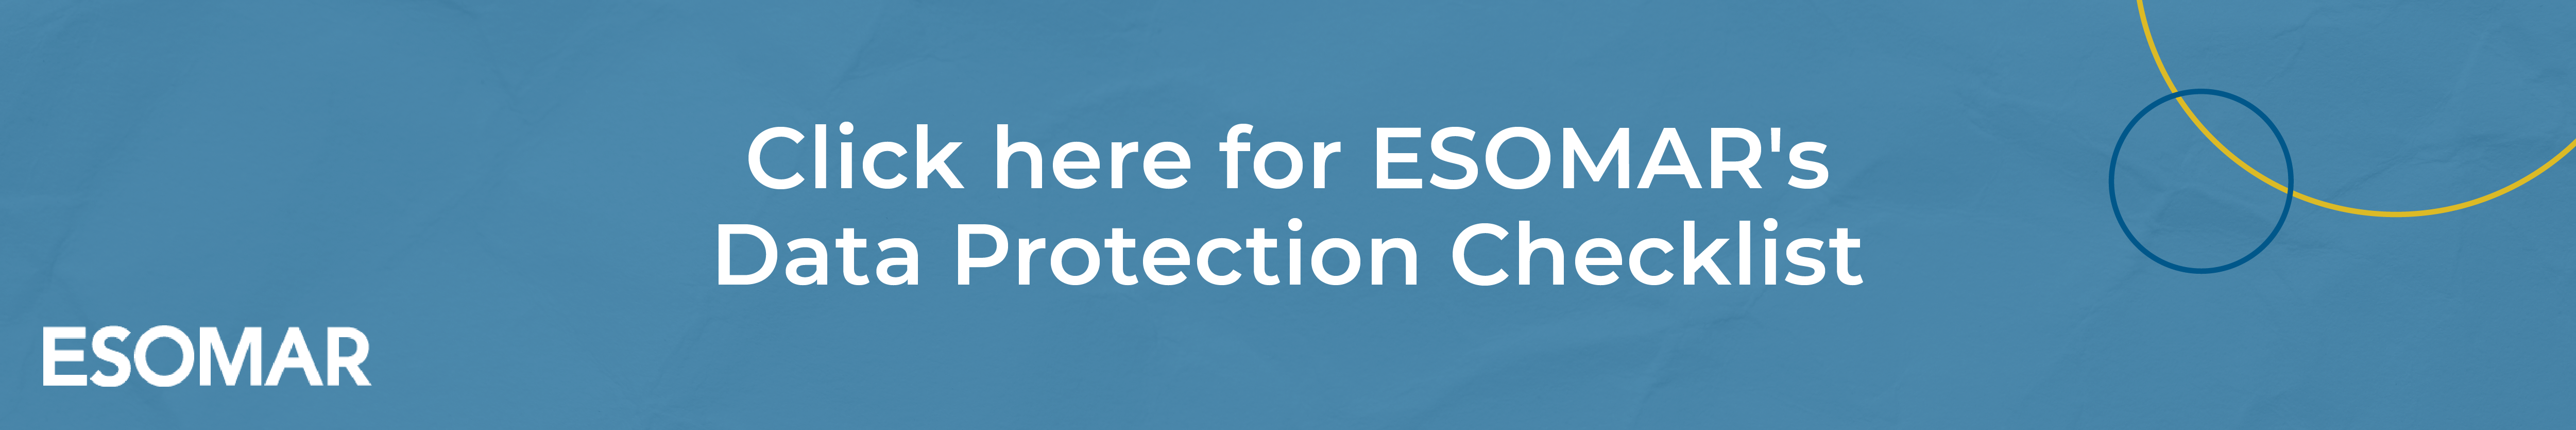 ESOMAR's Data Protection Checklist